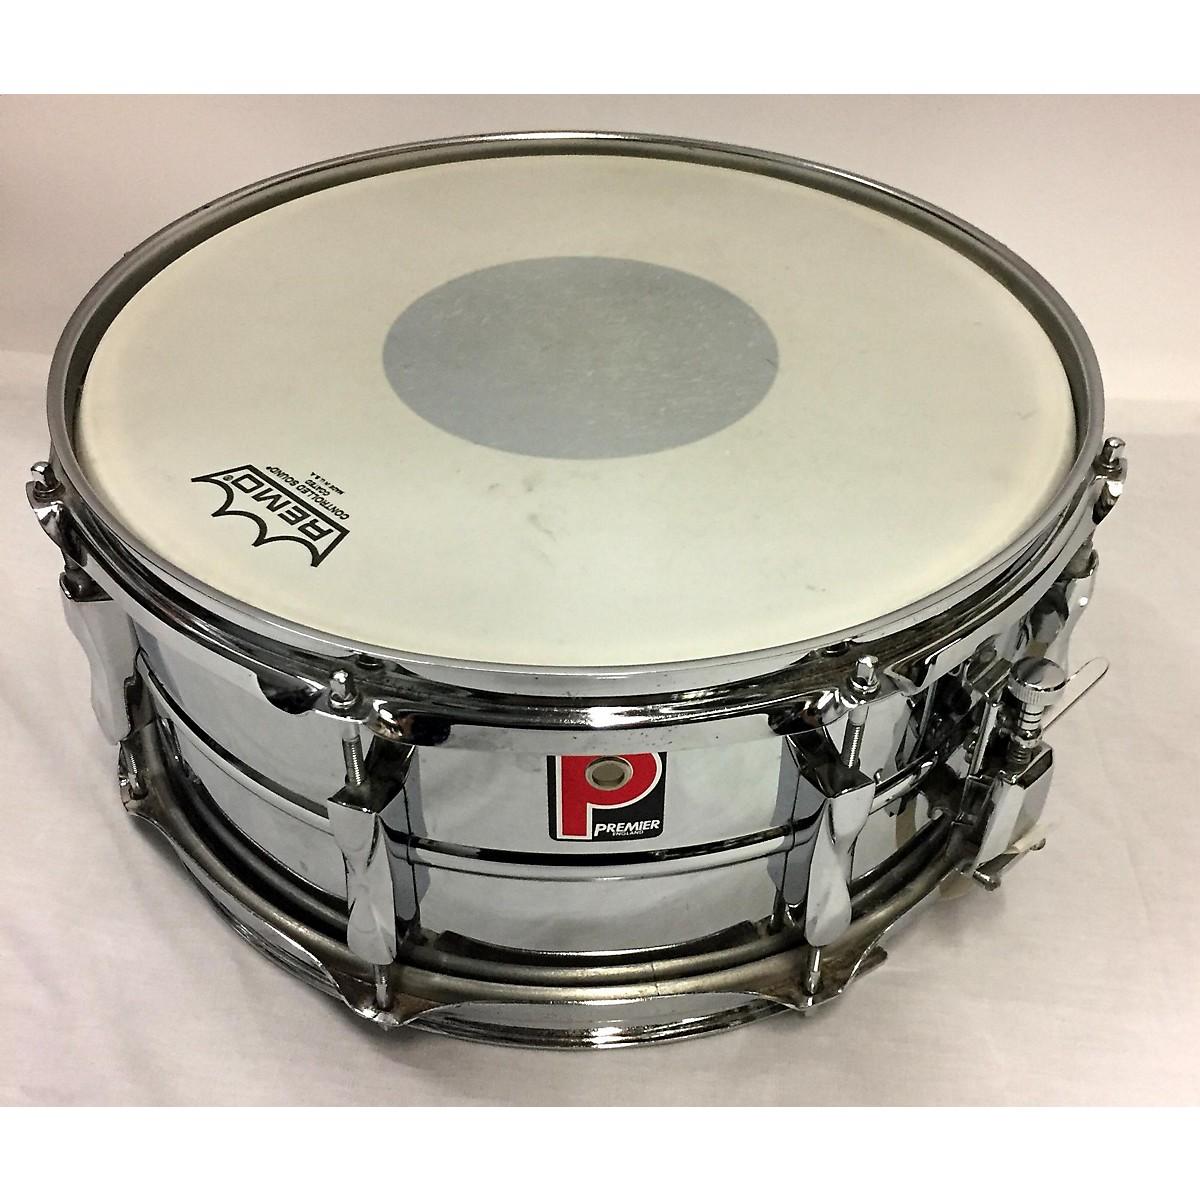 Premier 14X9 SNARE Drum